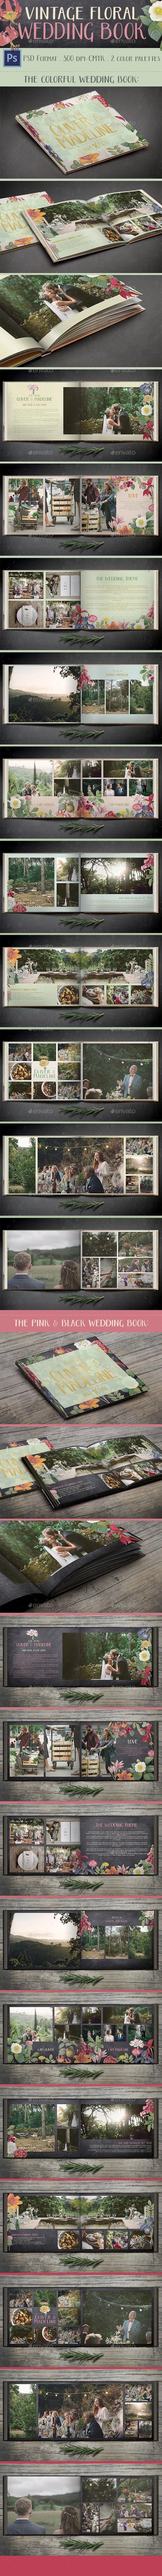 Vintage Floral Wedding Photo Book - Photo Albums Print Templates